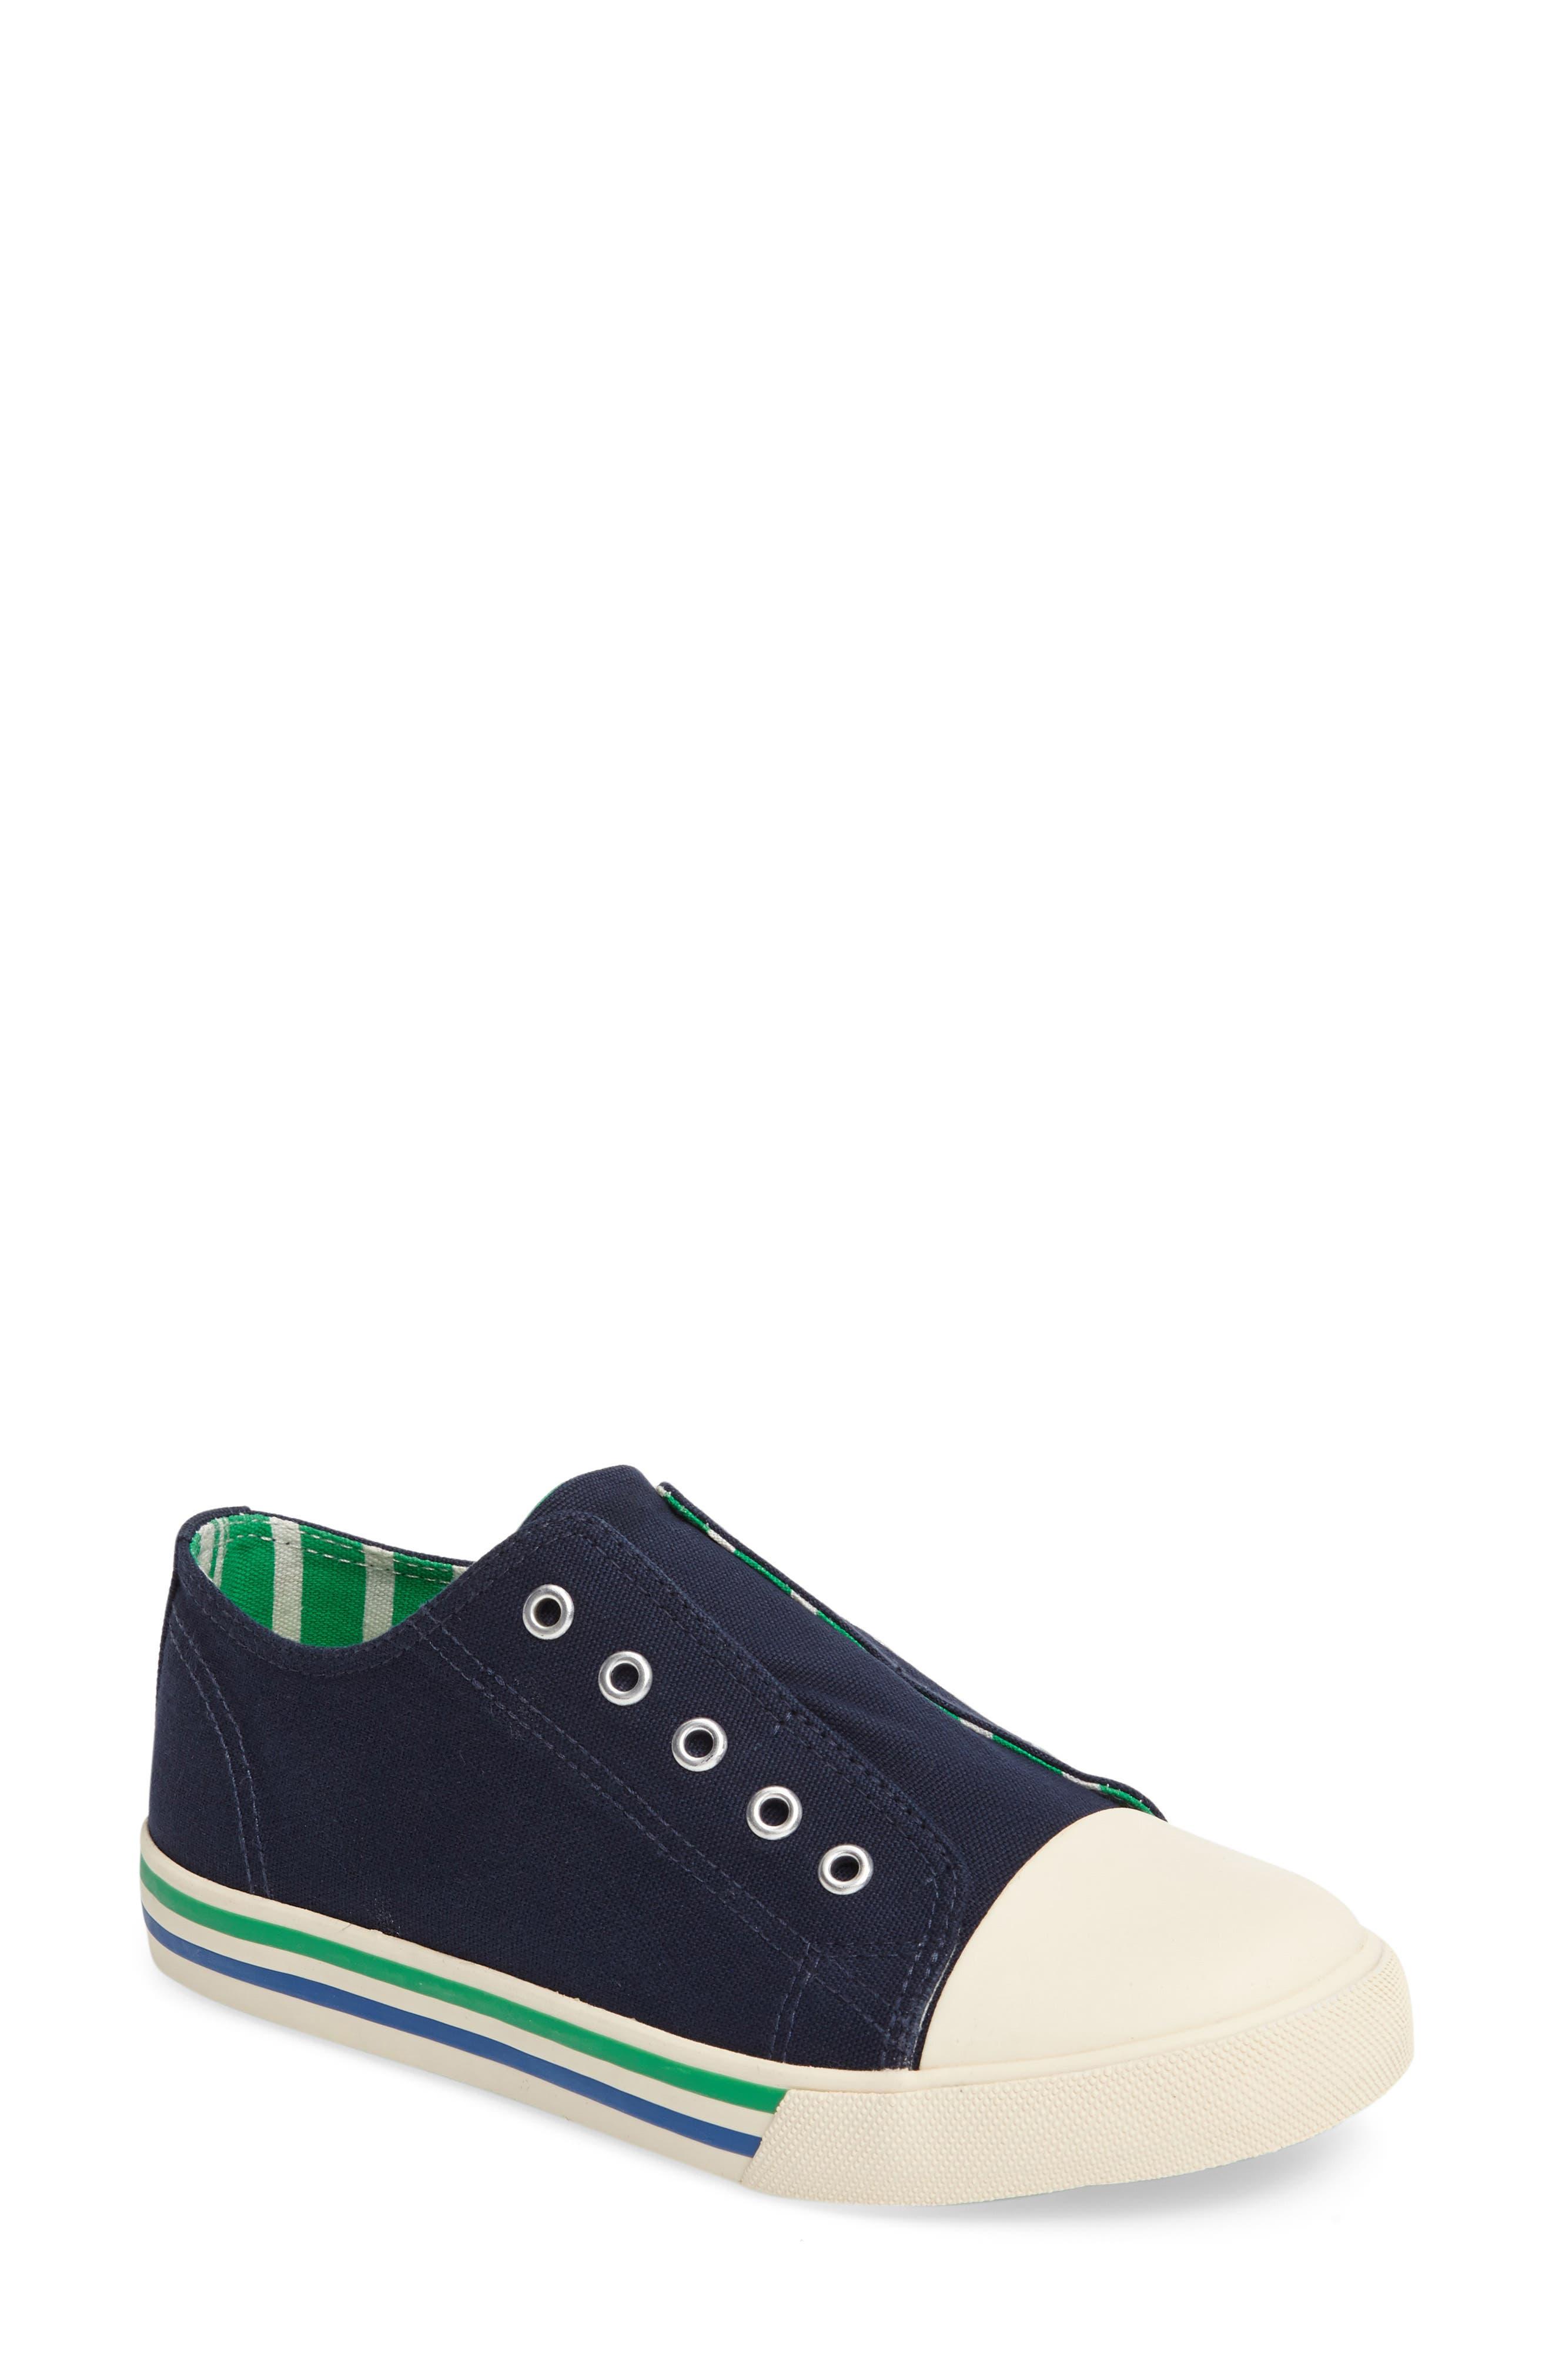 Main Image - Mini Boden Laceless Sneaker (Toddler, Little Kid & Big Kid)